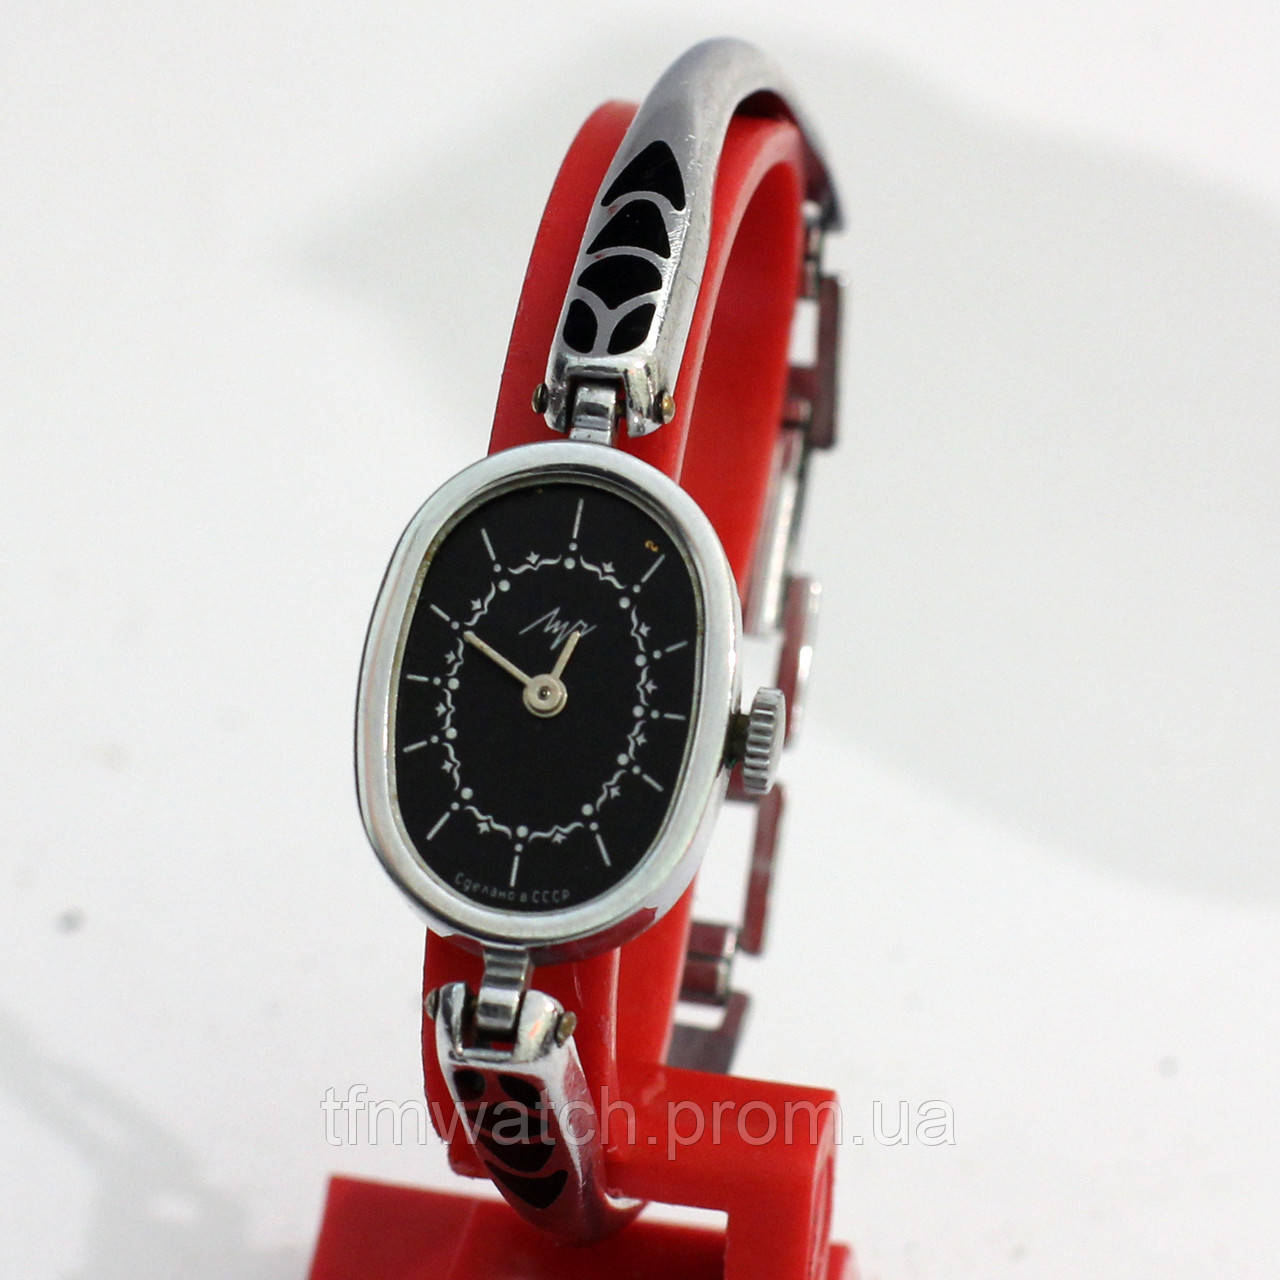 Наручные часы по 100 руб qwill часы женские наручные